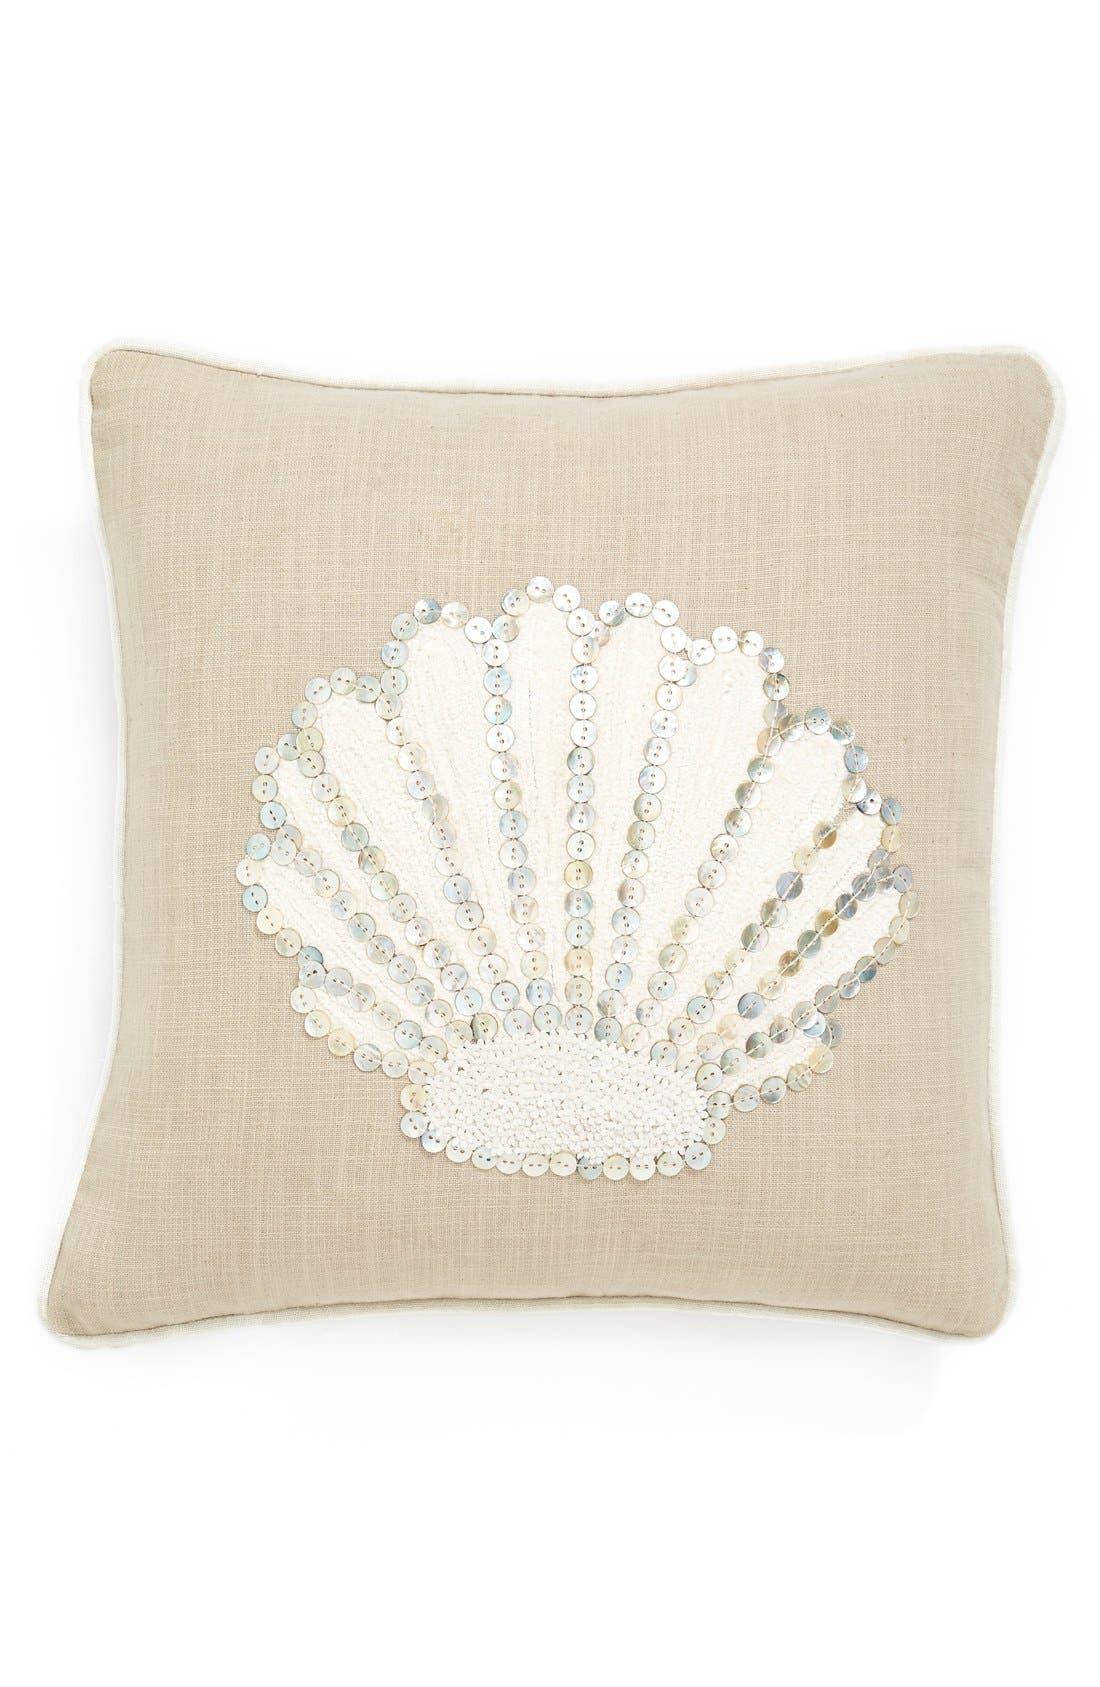 Main Image - Loloi 'Seashell' Pillow